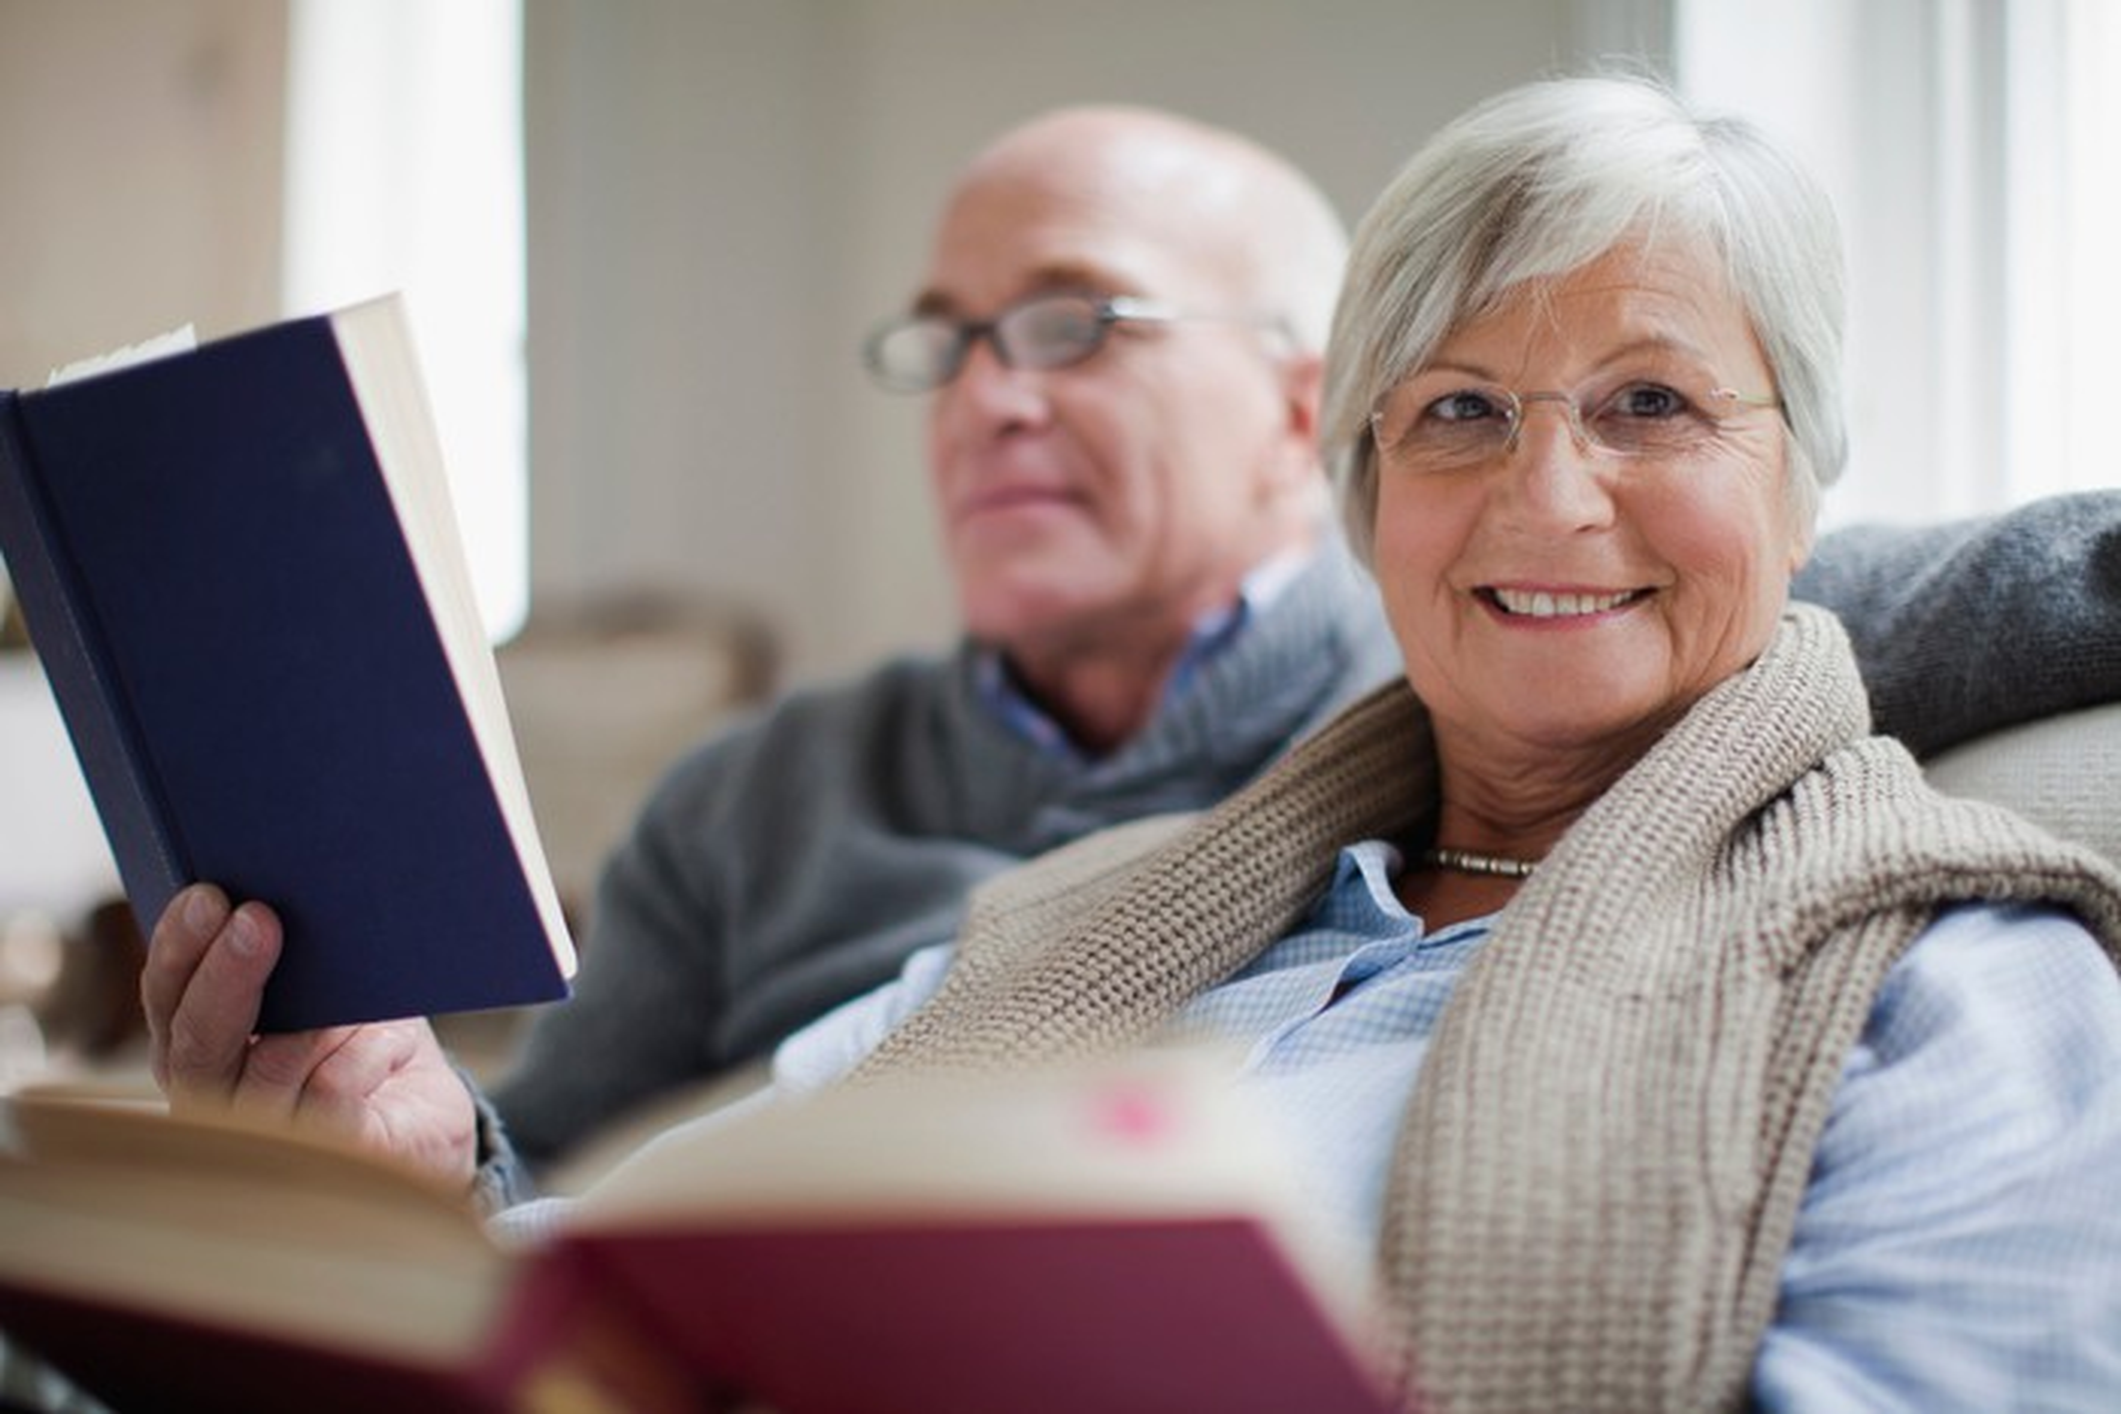 Senior couple smiling and reading books